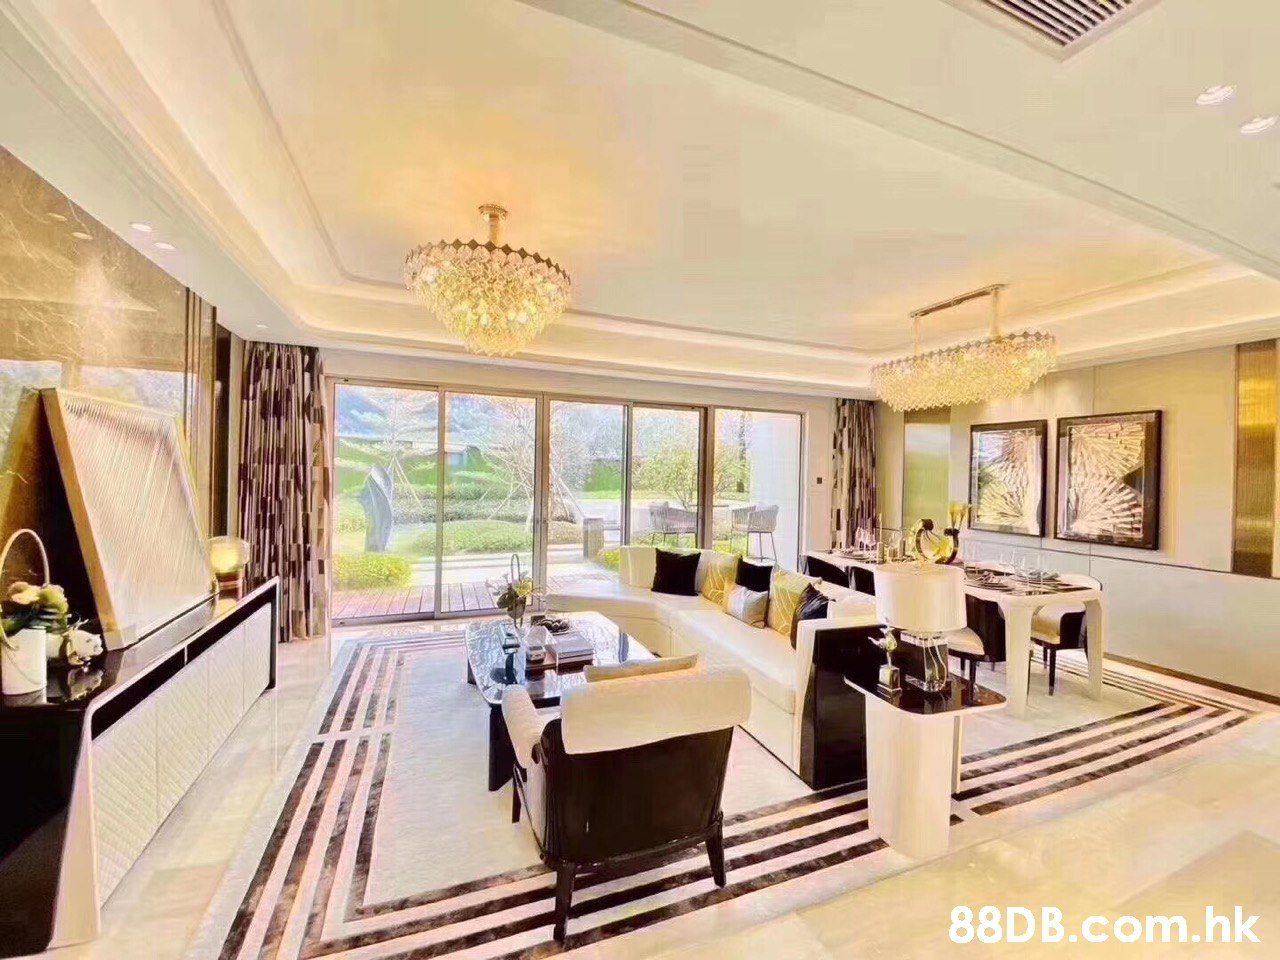 .hk  Property,Room,Interior design,Building,Ceiling